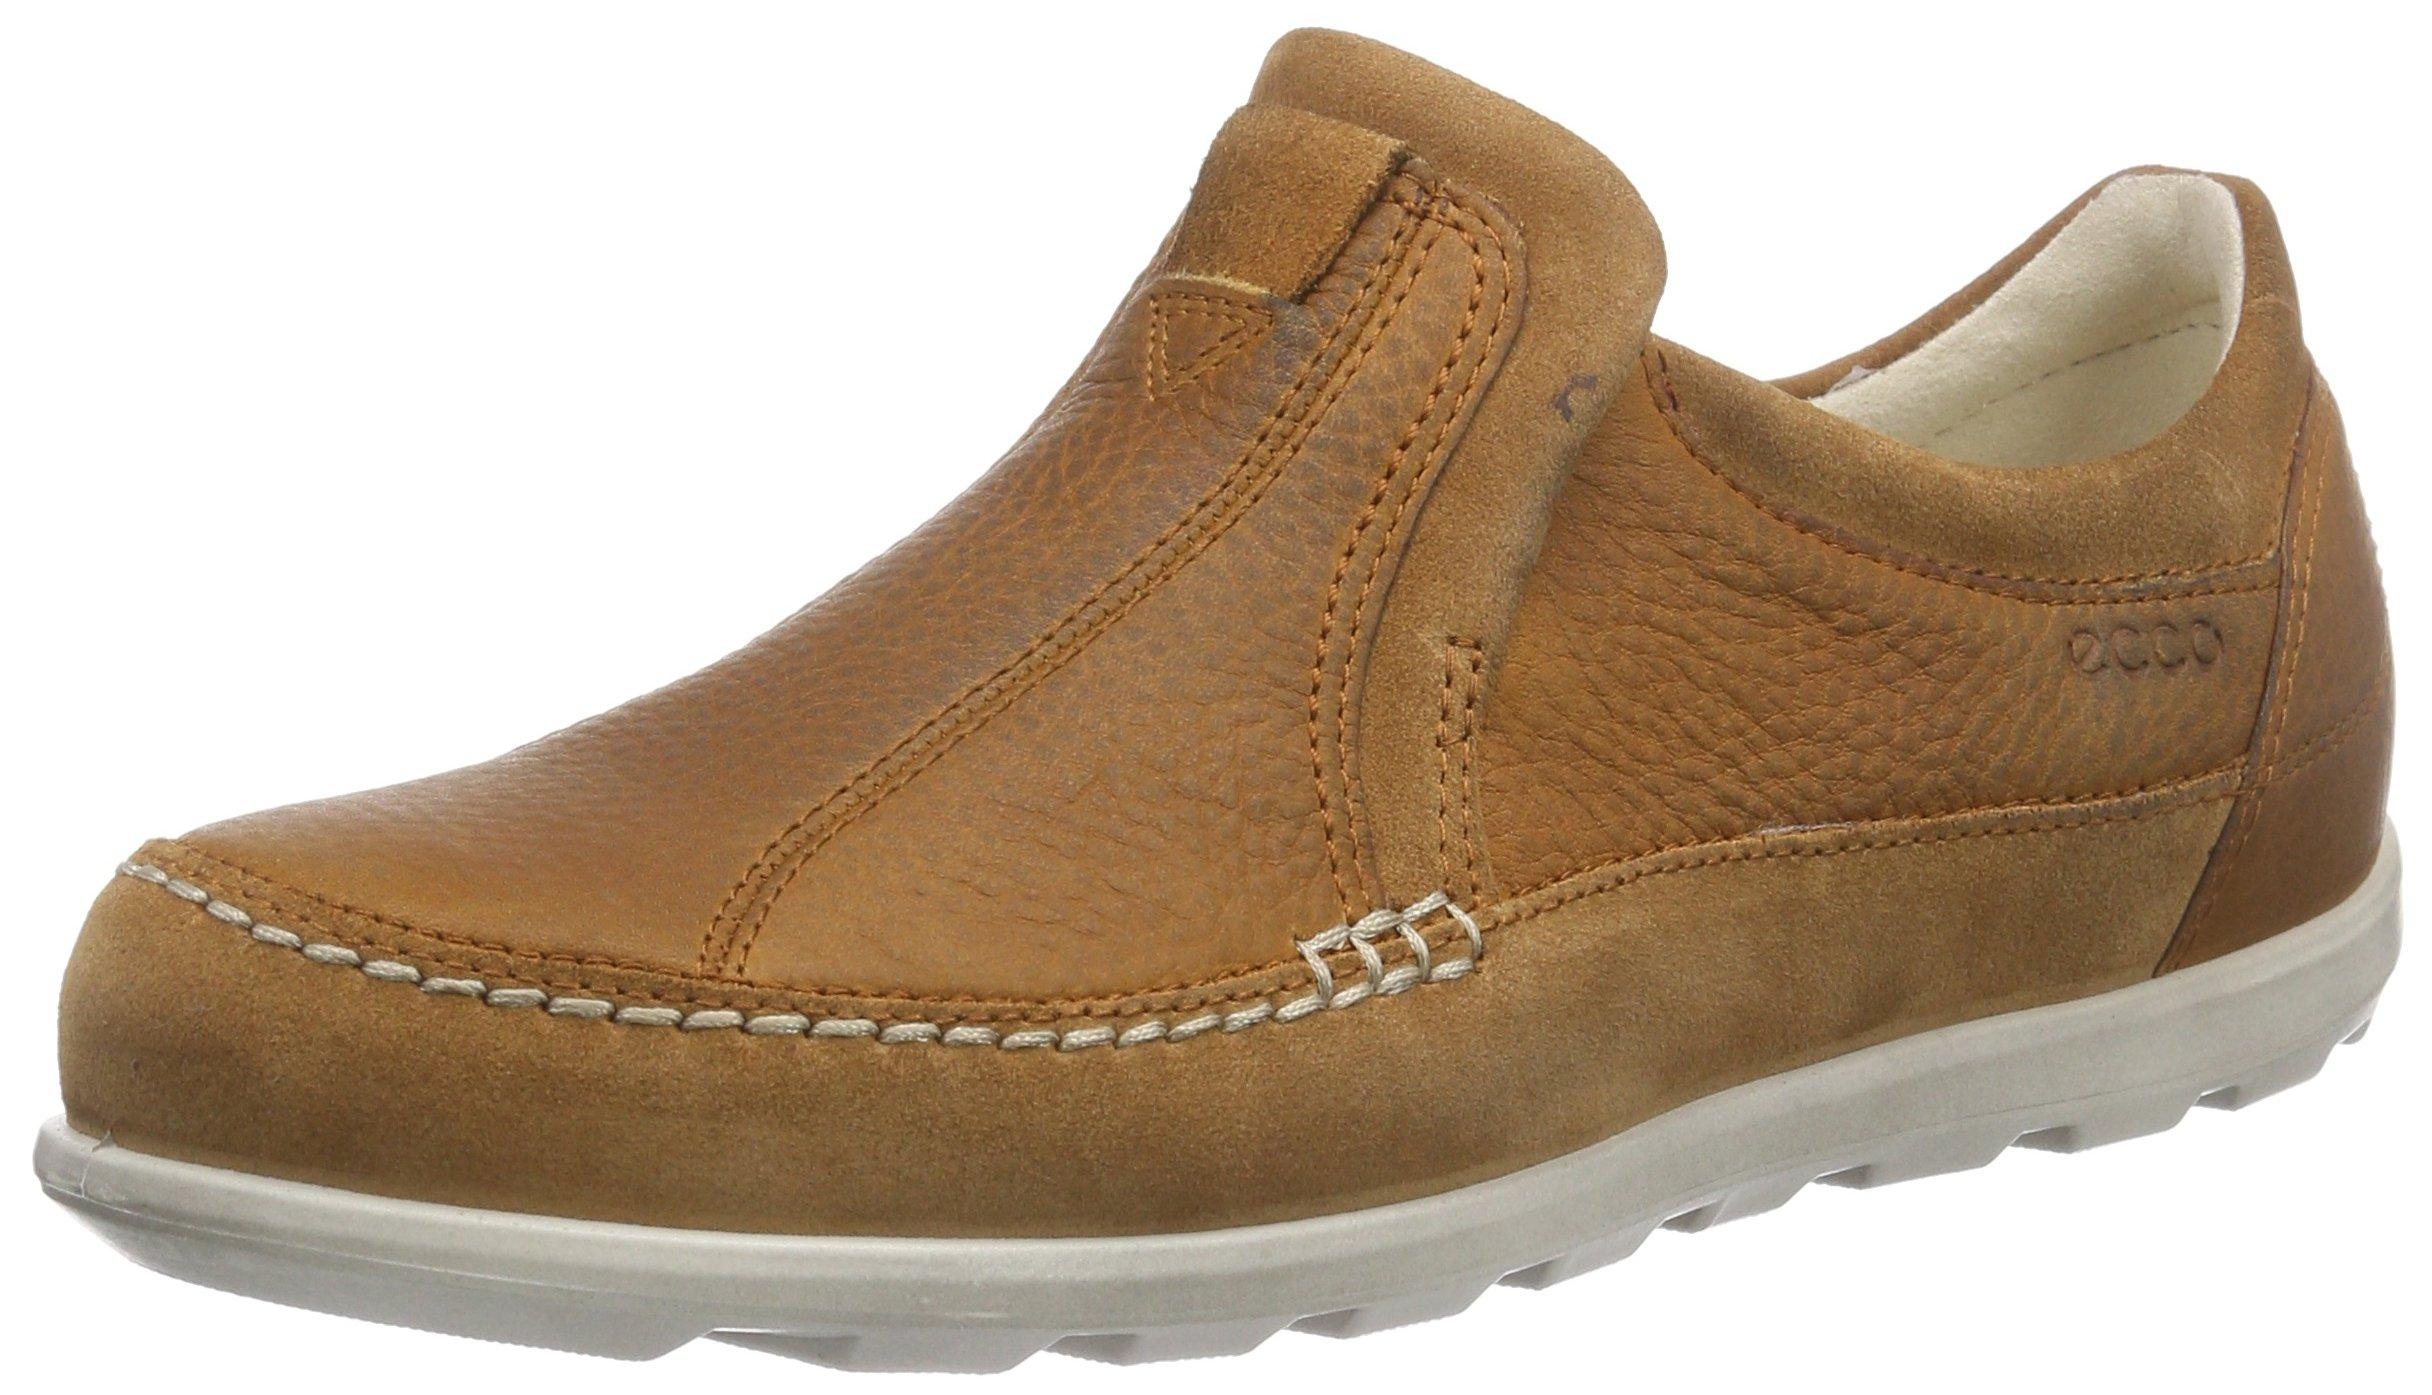 Ecco Footwear Womens Cayla Slip On Flat, Amber, 38 EU/7-7.5 M US